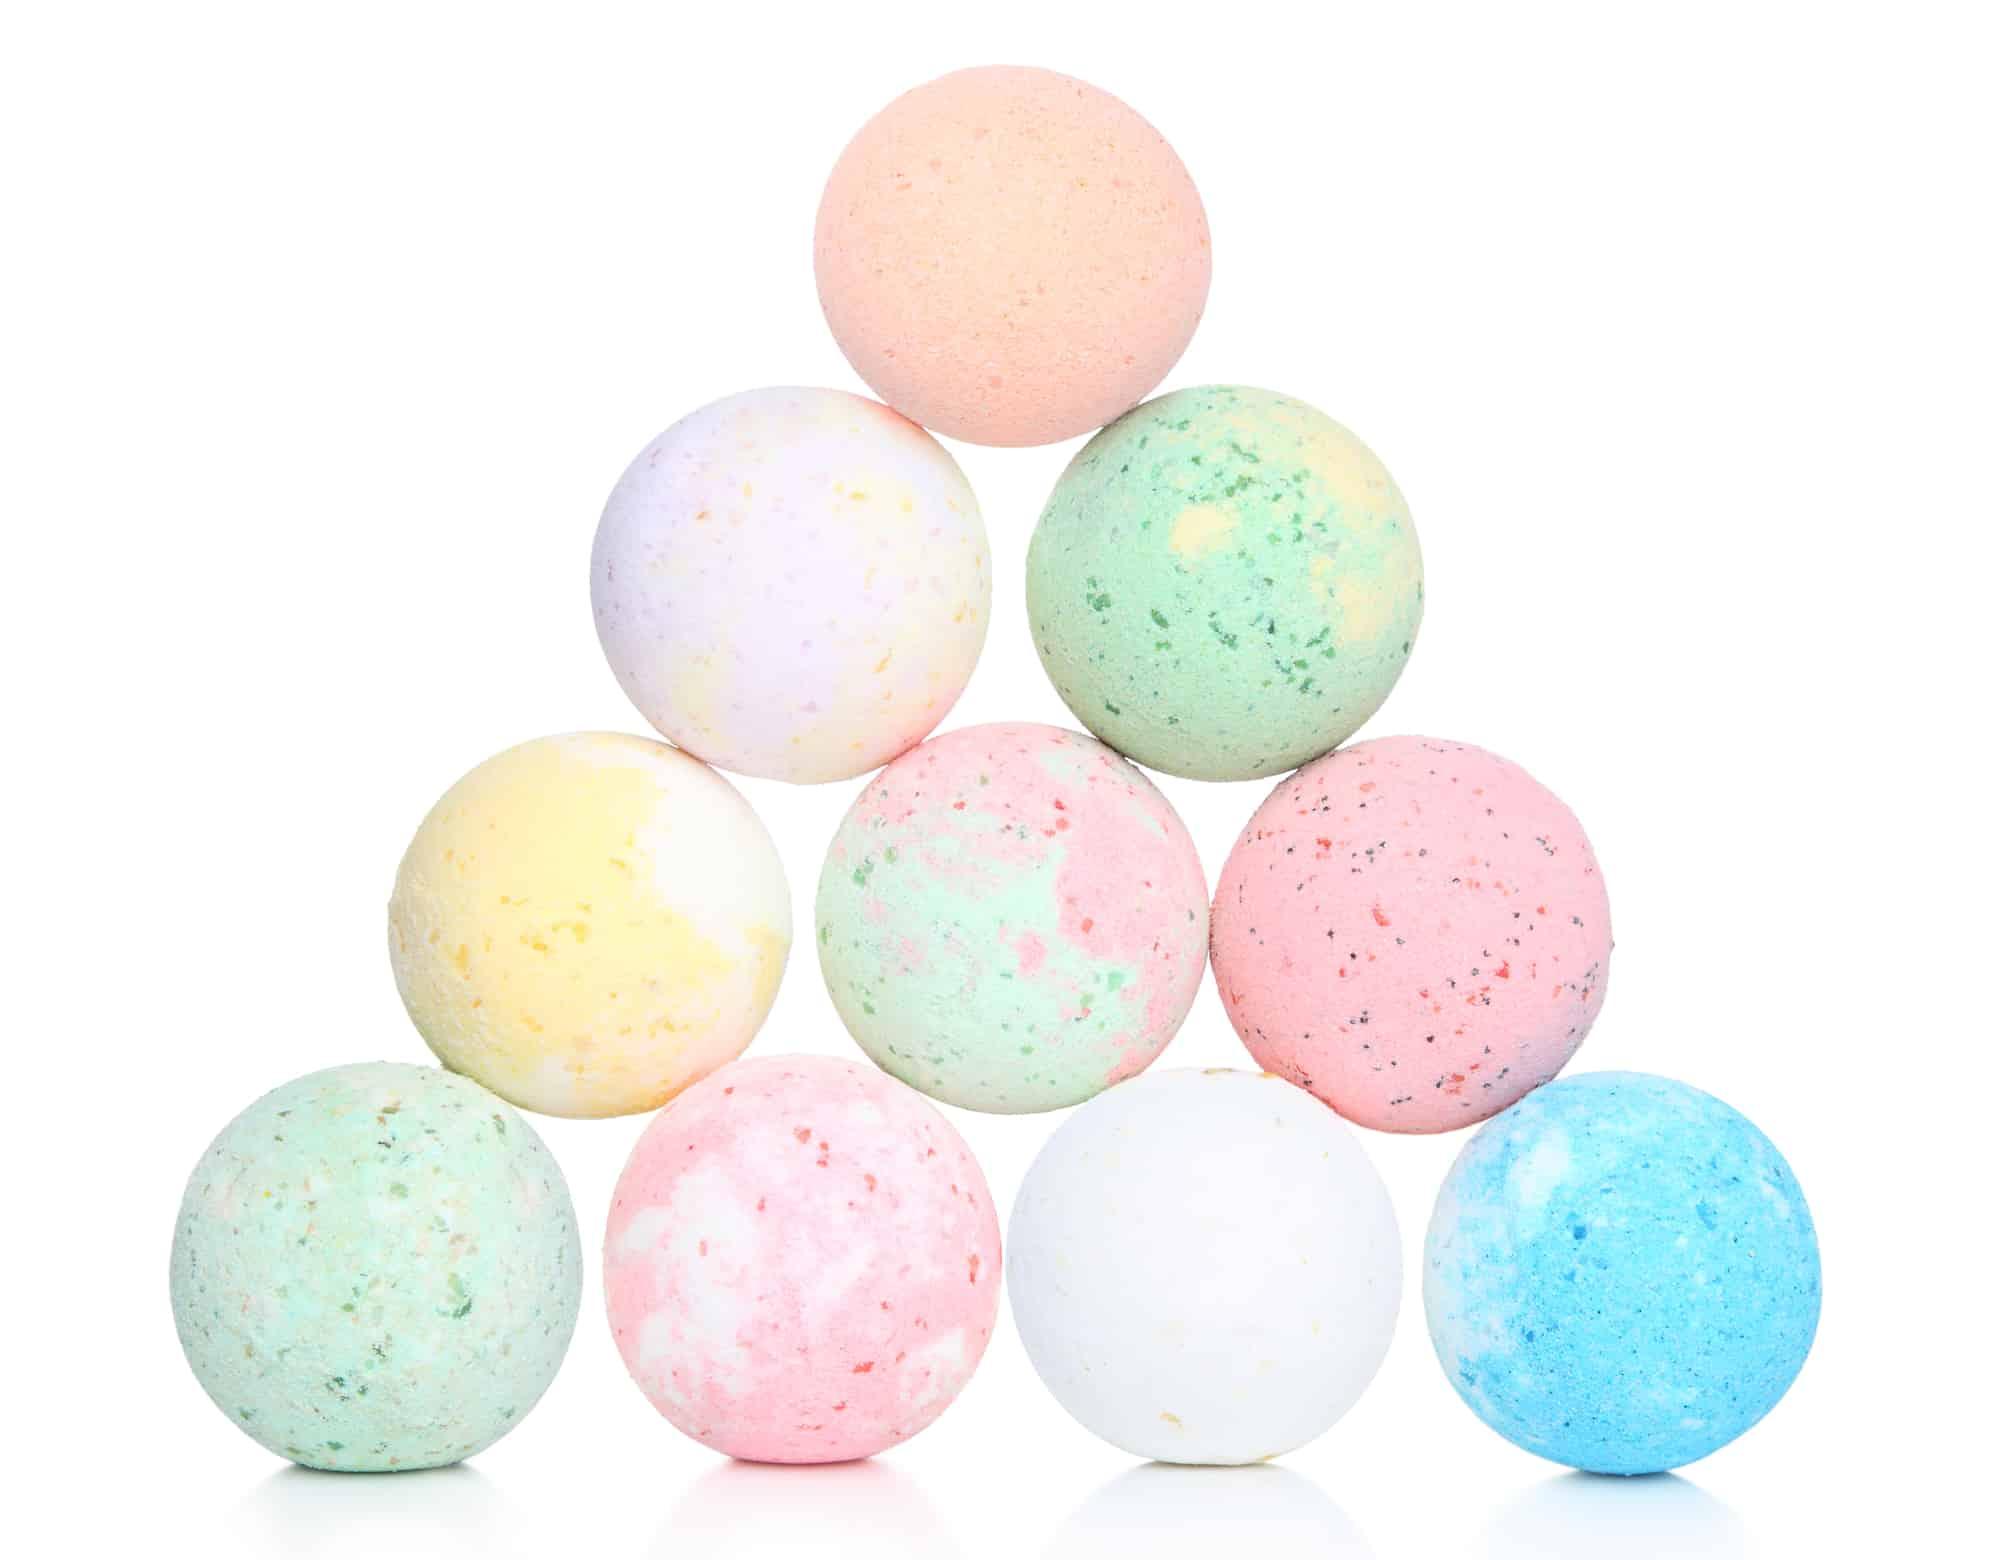 Pyramid of multi colored bath bombs